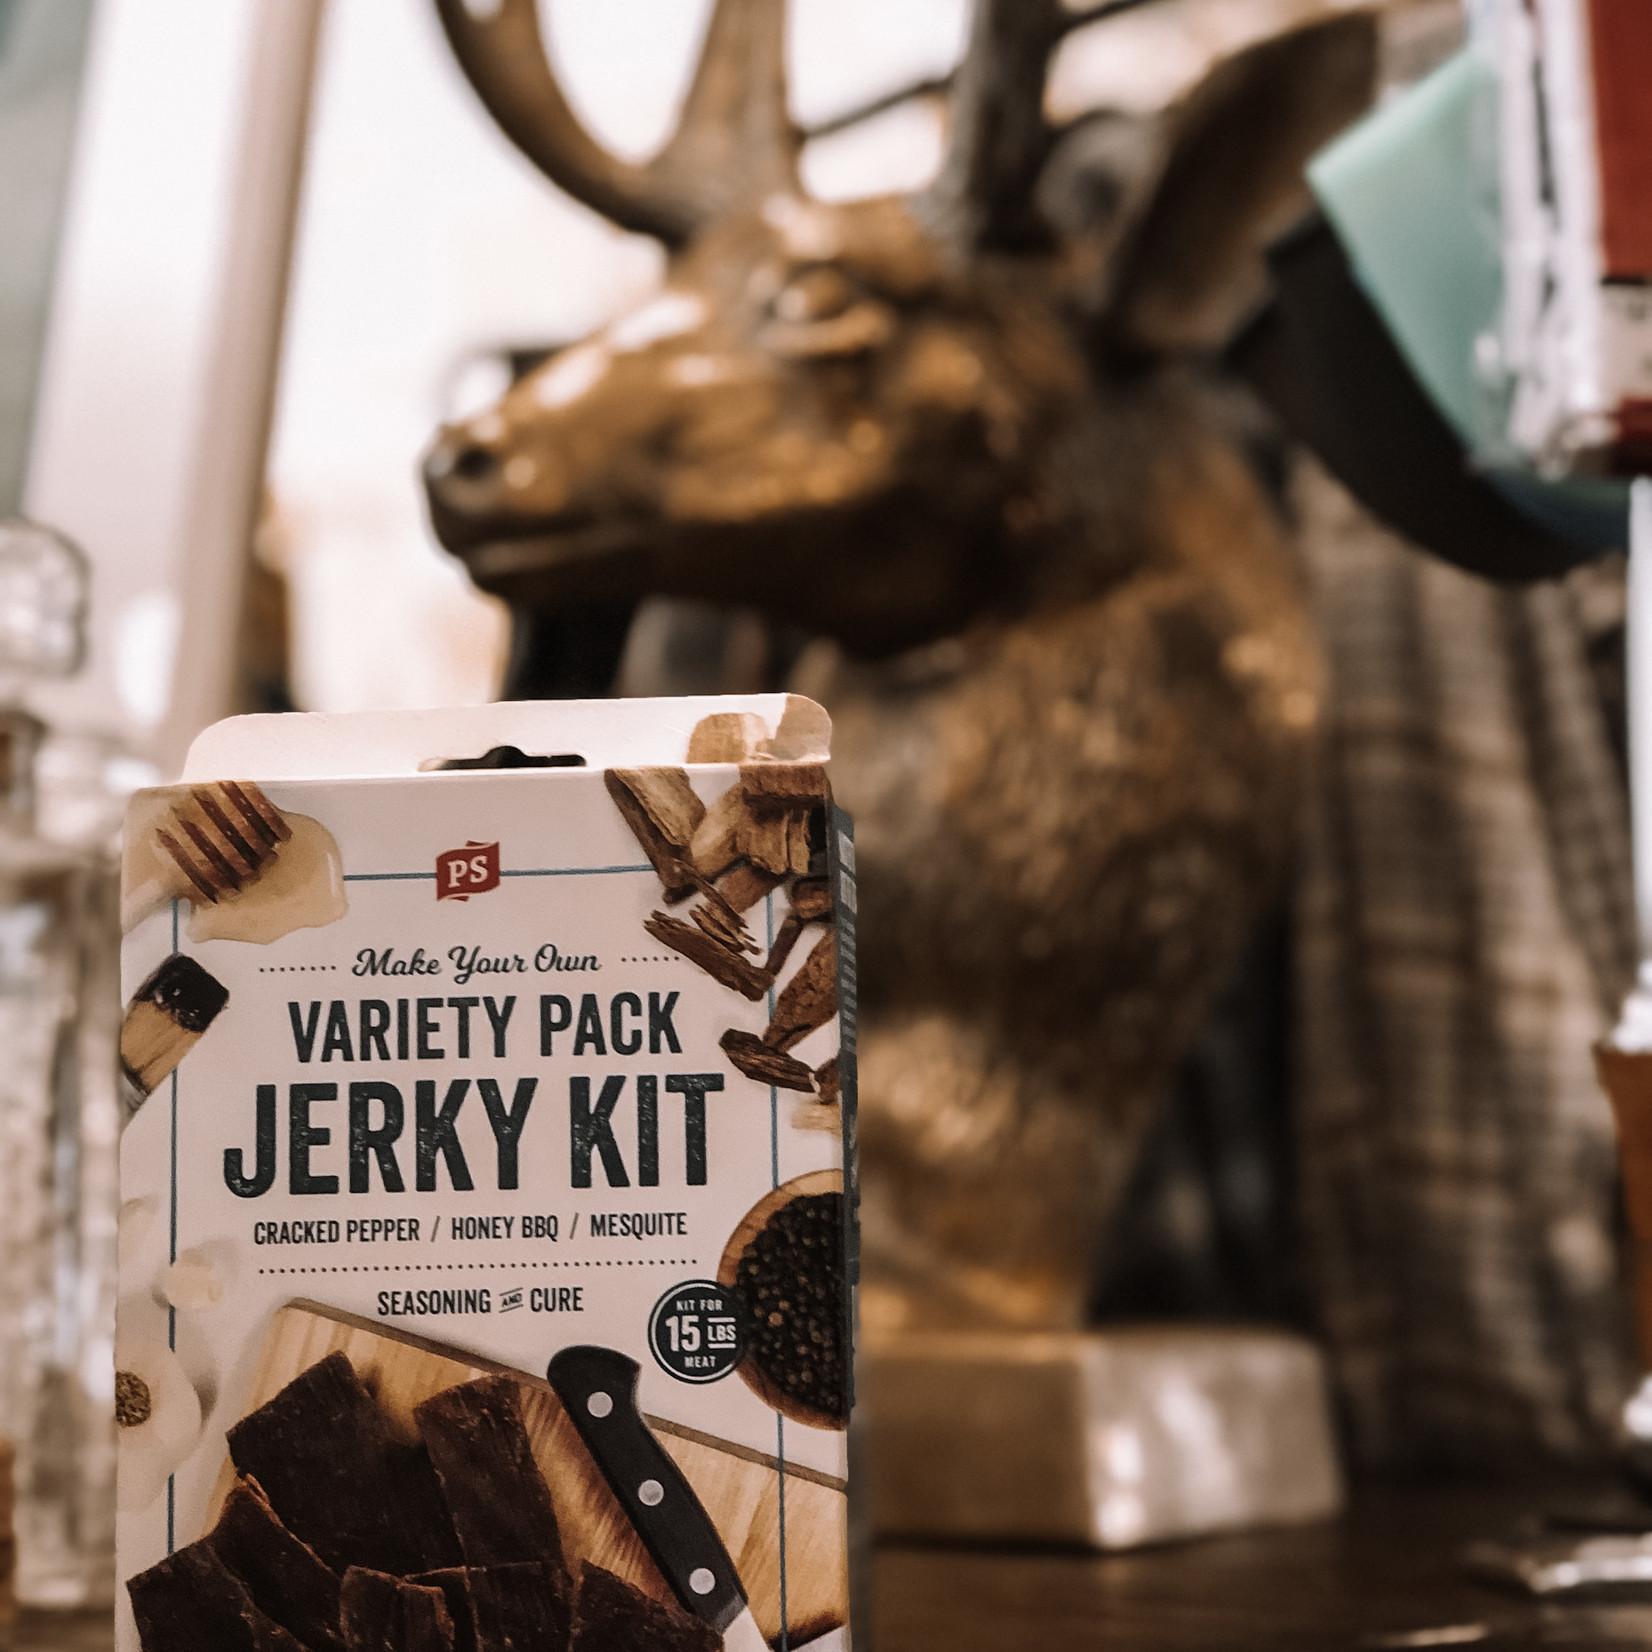 PS Seasoning PS Seasoning Variety Pack DIY Jerky Kit